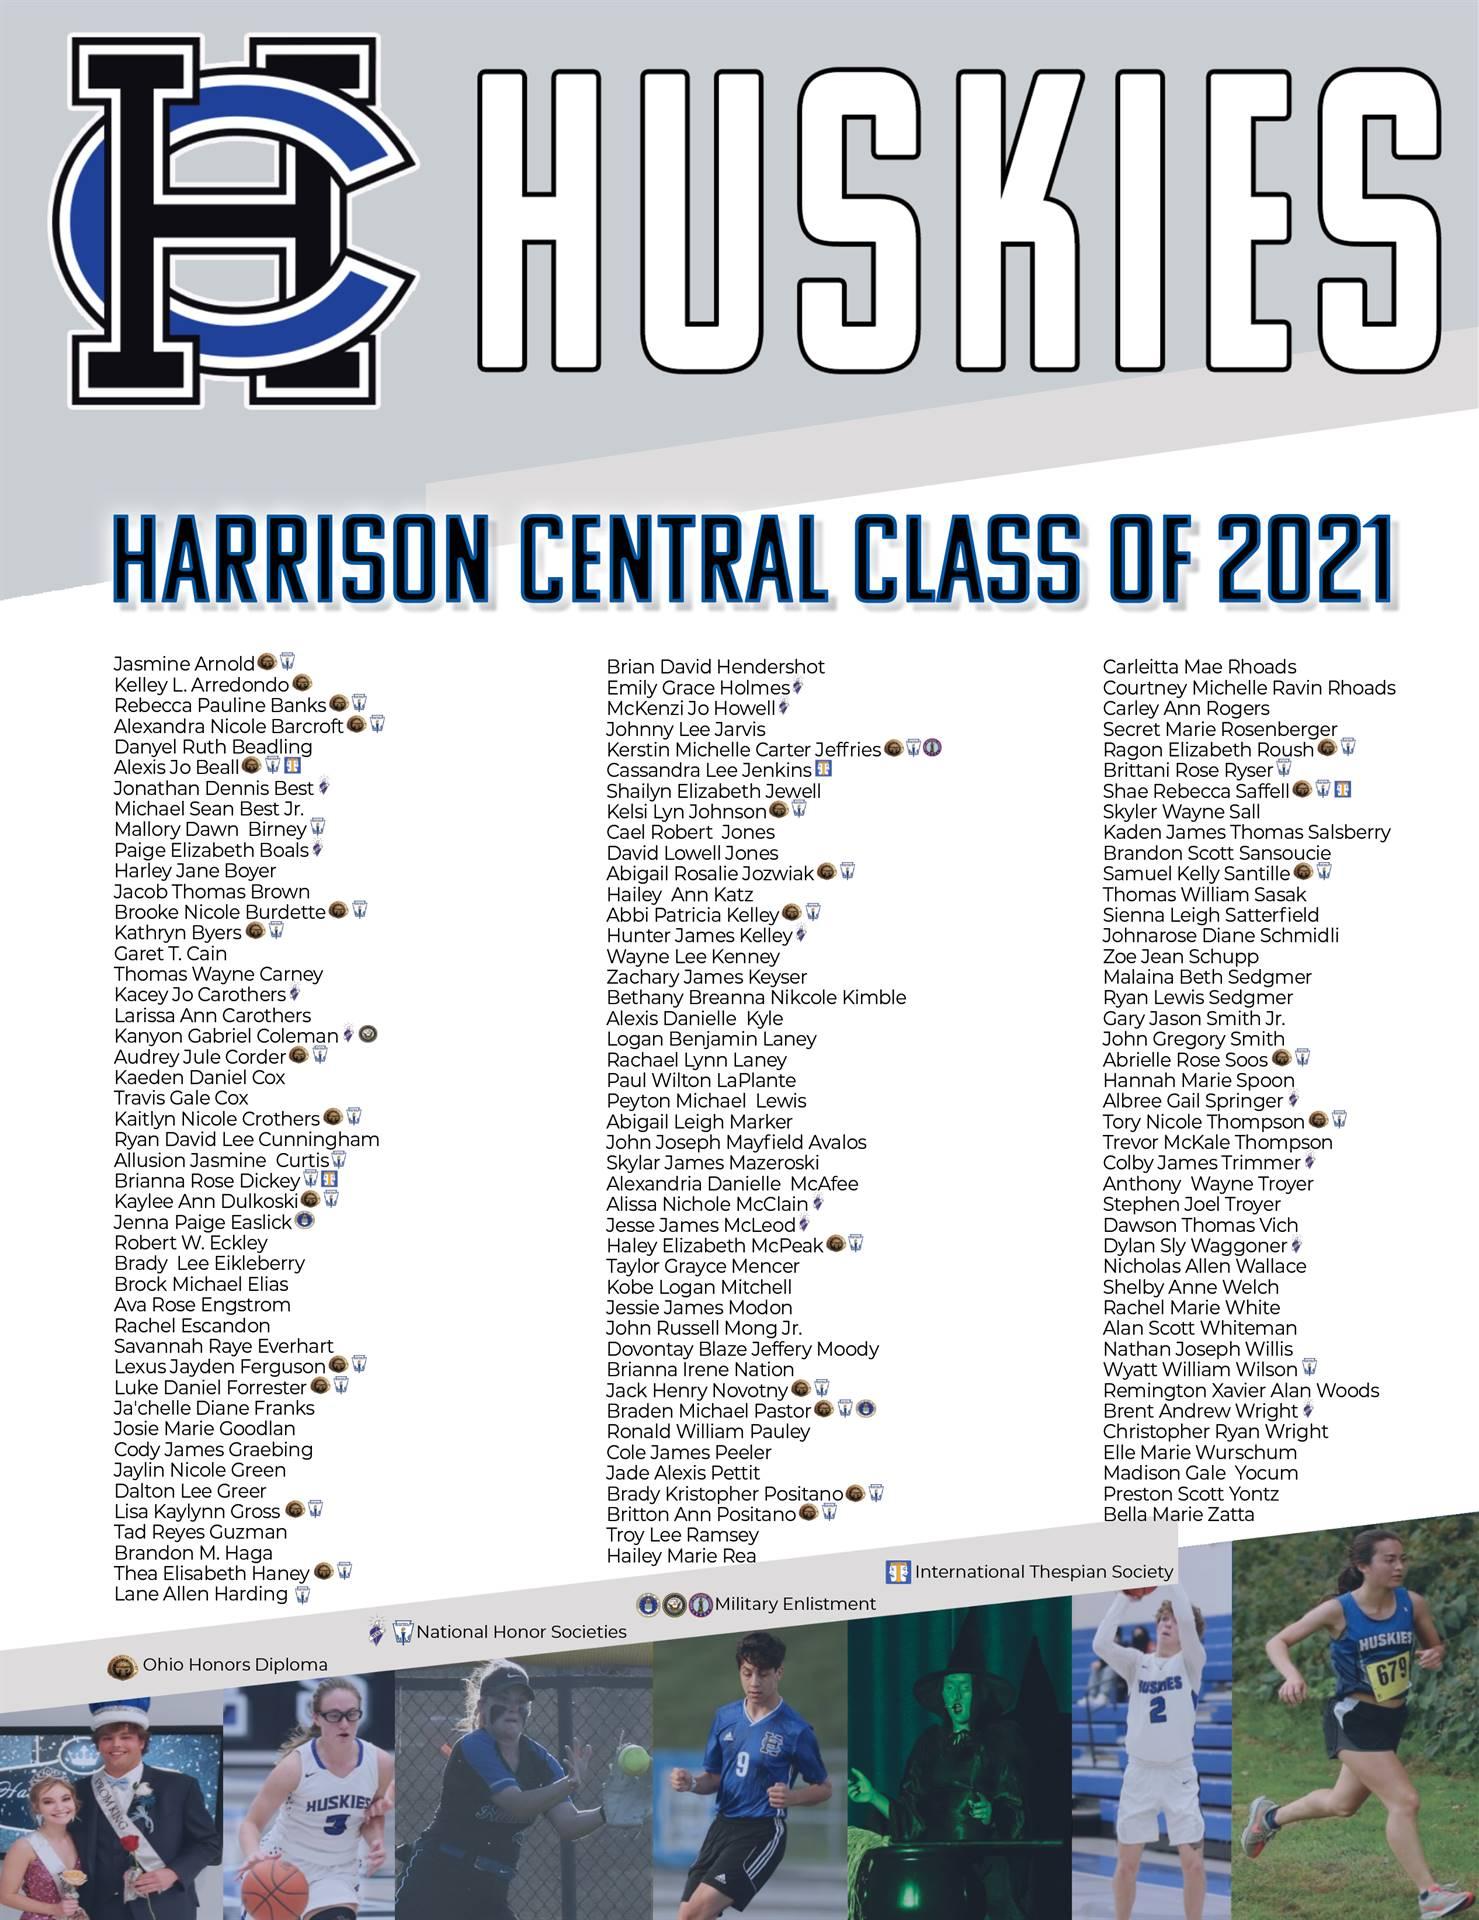 Class of 2021 Graduate List